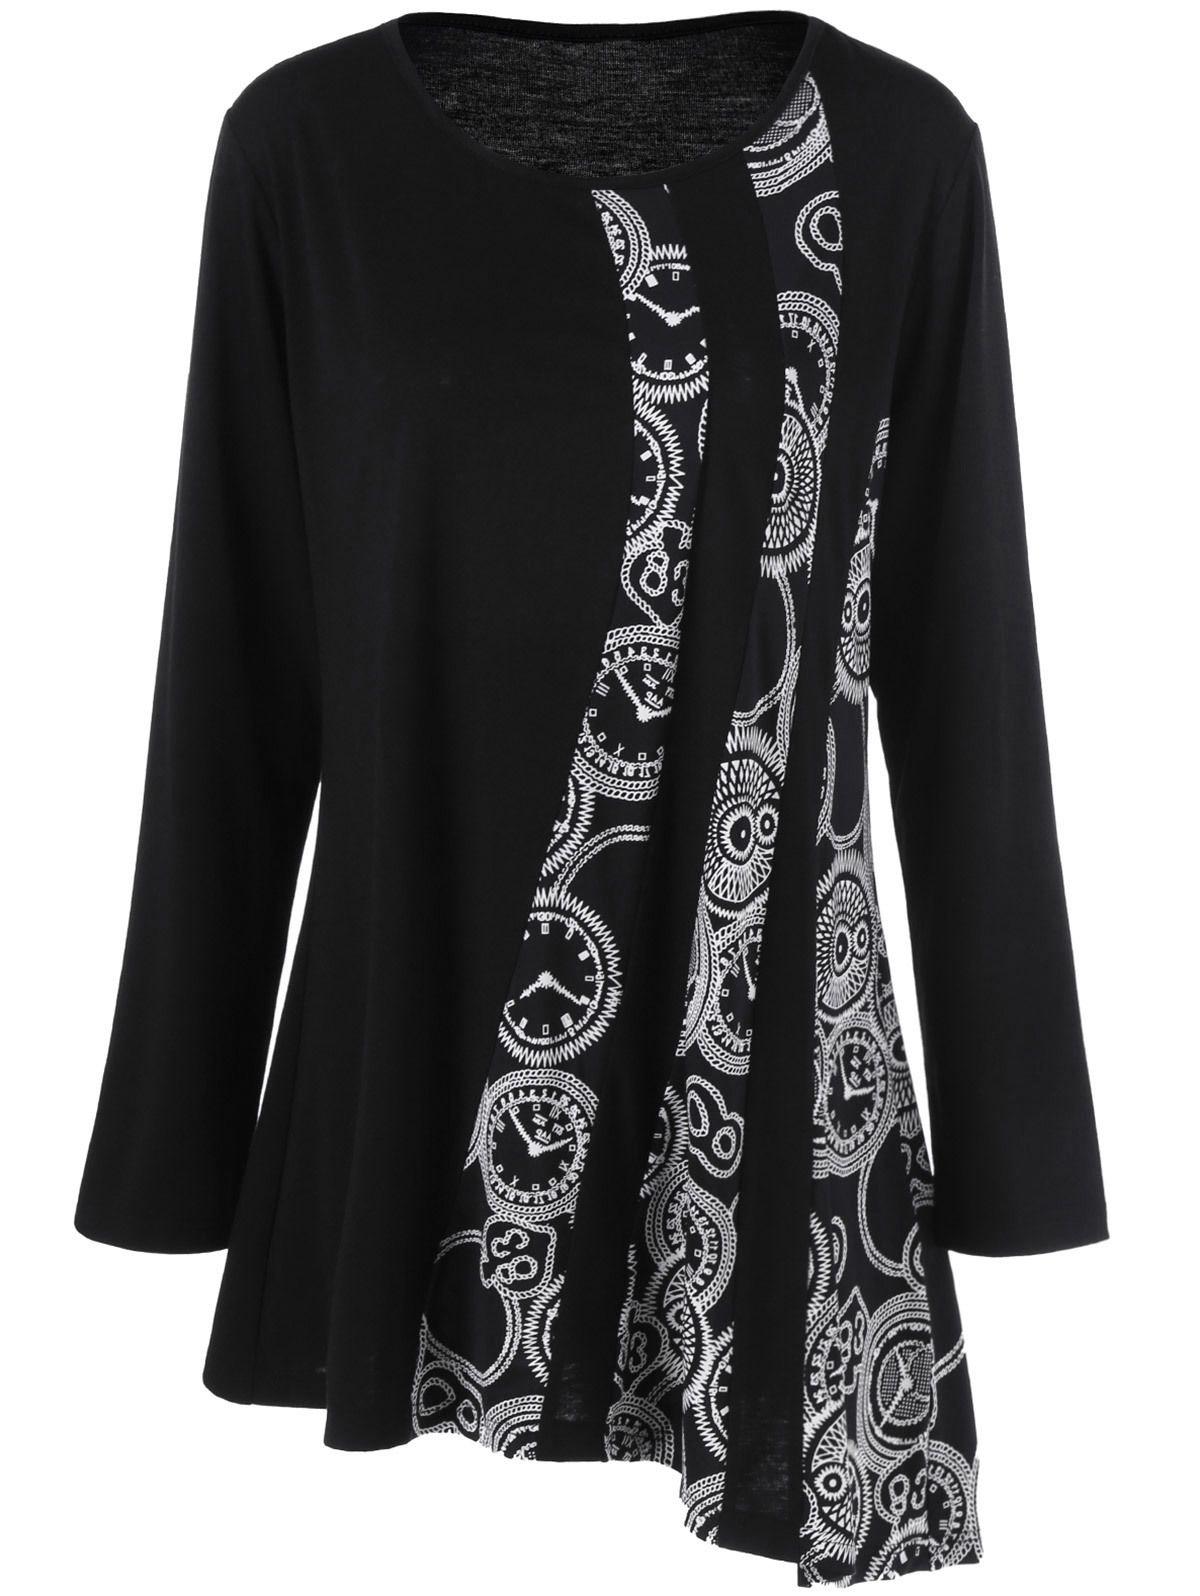 e3ac3eca351 Gamiss Plus Size 5XL Printed Asymmetric Tunic T Shirt Women Autumn 2017  Long Sleeve Asymmetrical Tops Tees Black T Shirt Y1891307 T Shirt Site  Online Tees ...